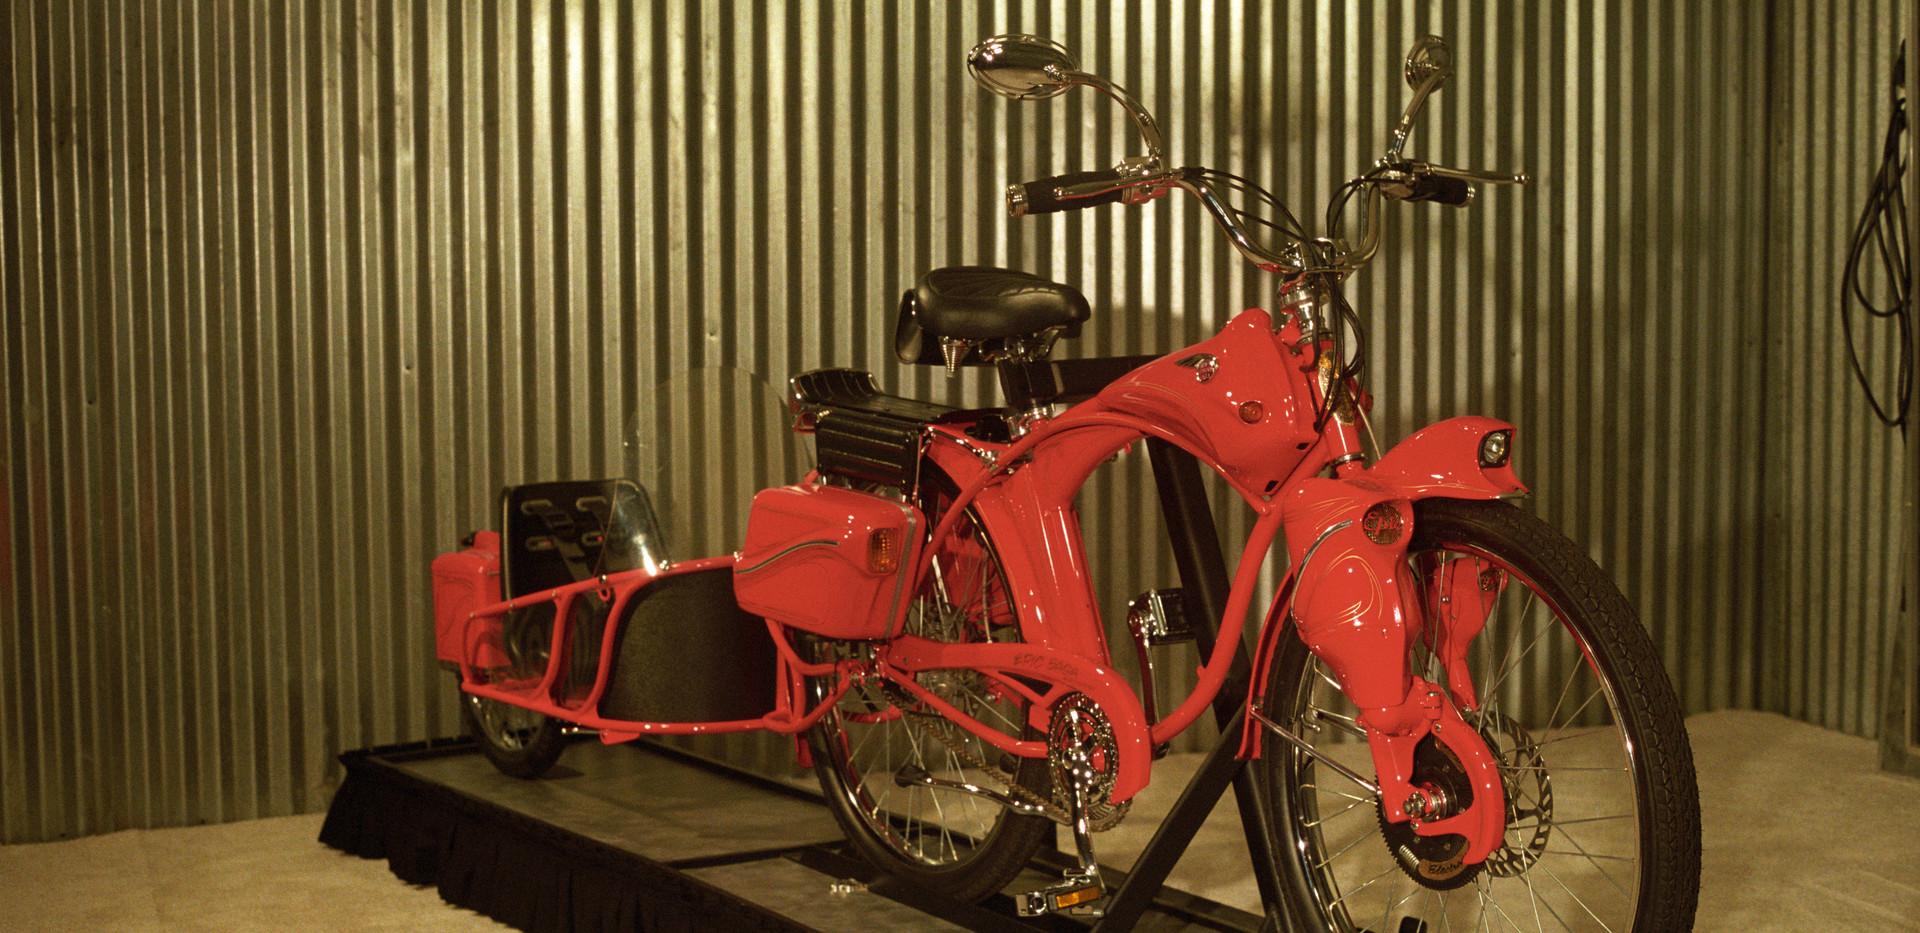 EPIC_Bike_Trailer_R1.jpg